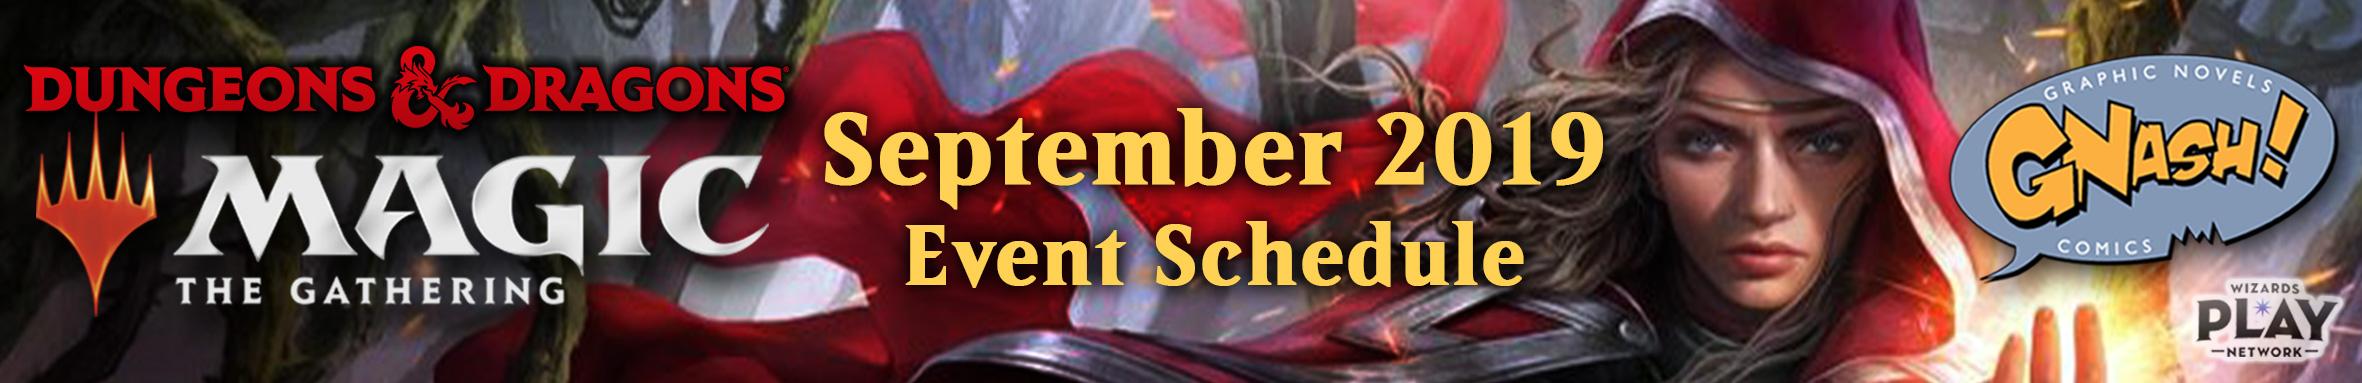 magic-gathering-devon-september